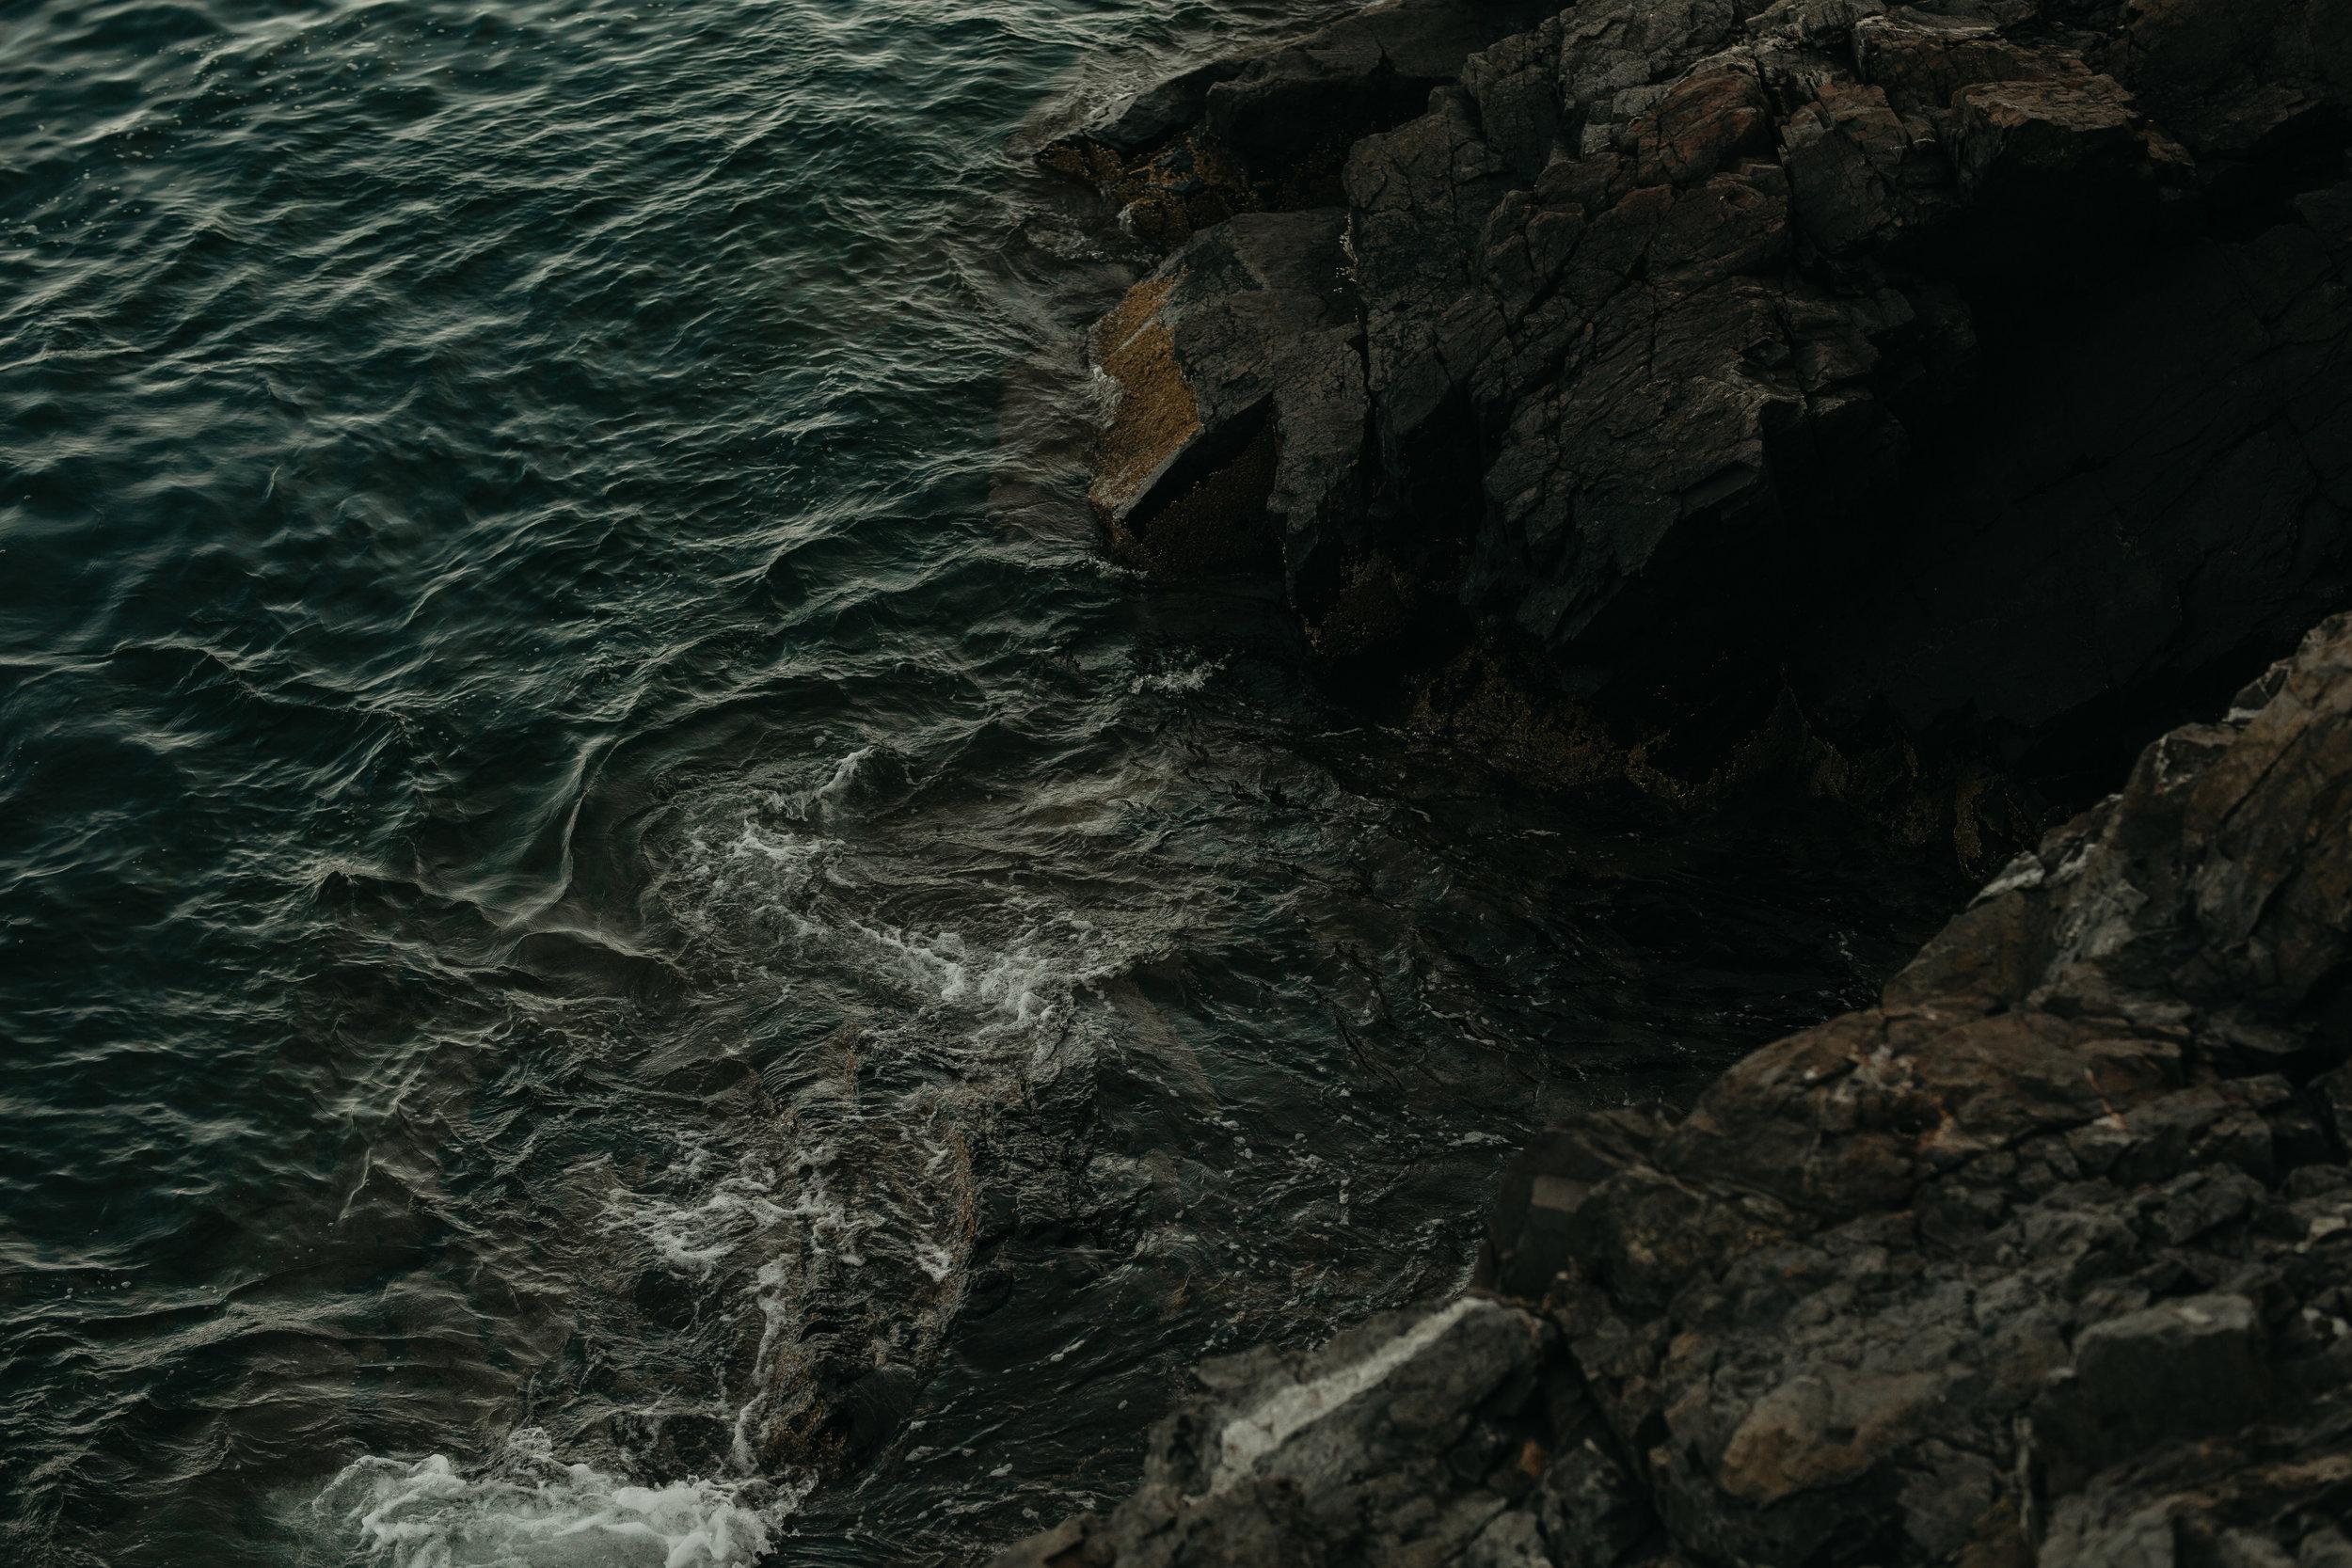 nicole-daacke-photography-Elopement-rocky-shoreline-coast-Acadia-National-Park-elopement-photographer-inspiration-maine-elopement-otter-cliffs-schoonic-head-point-40.jpg